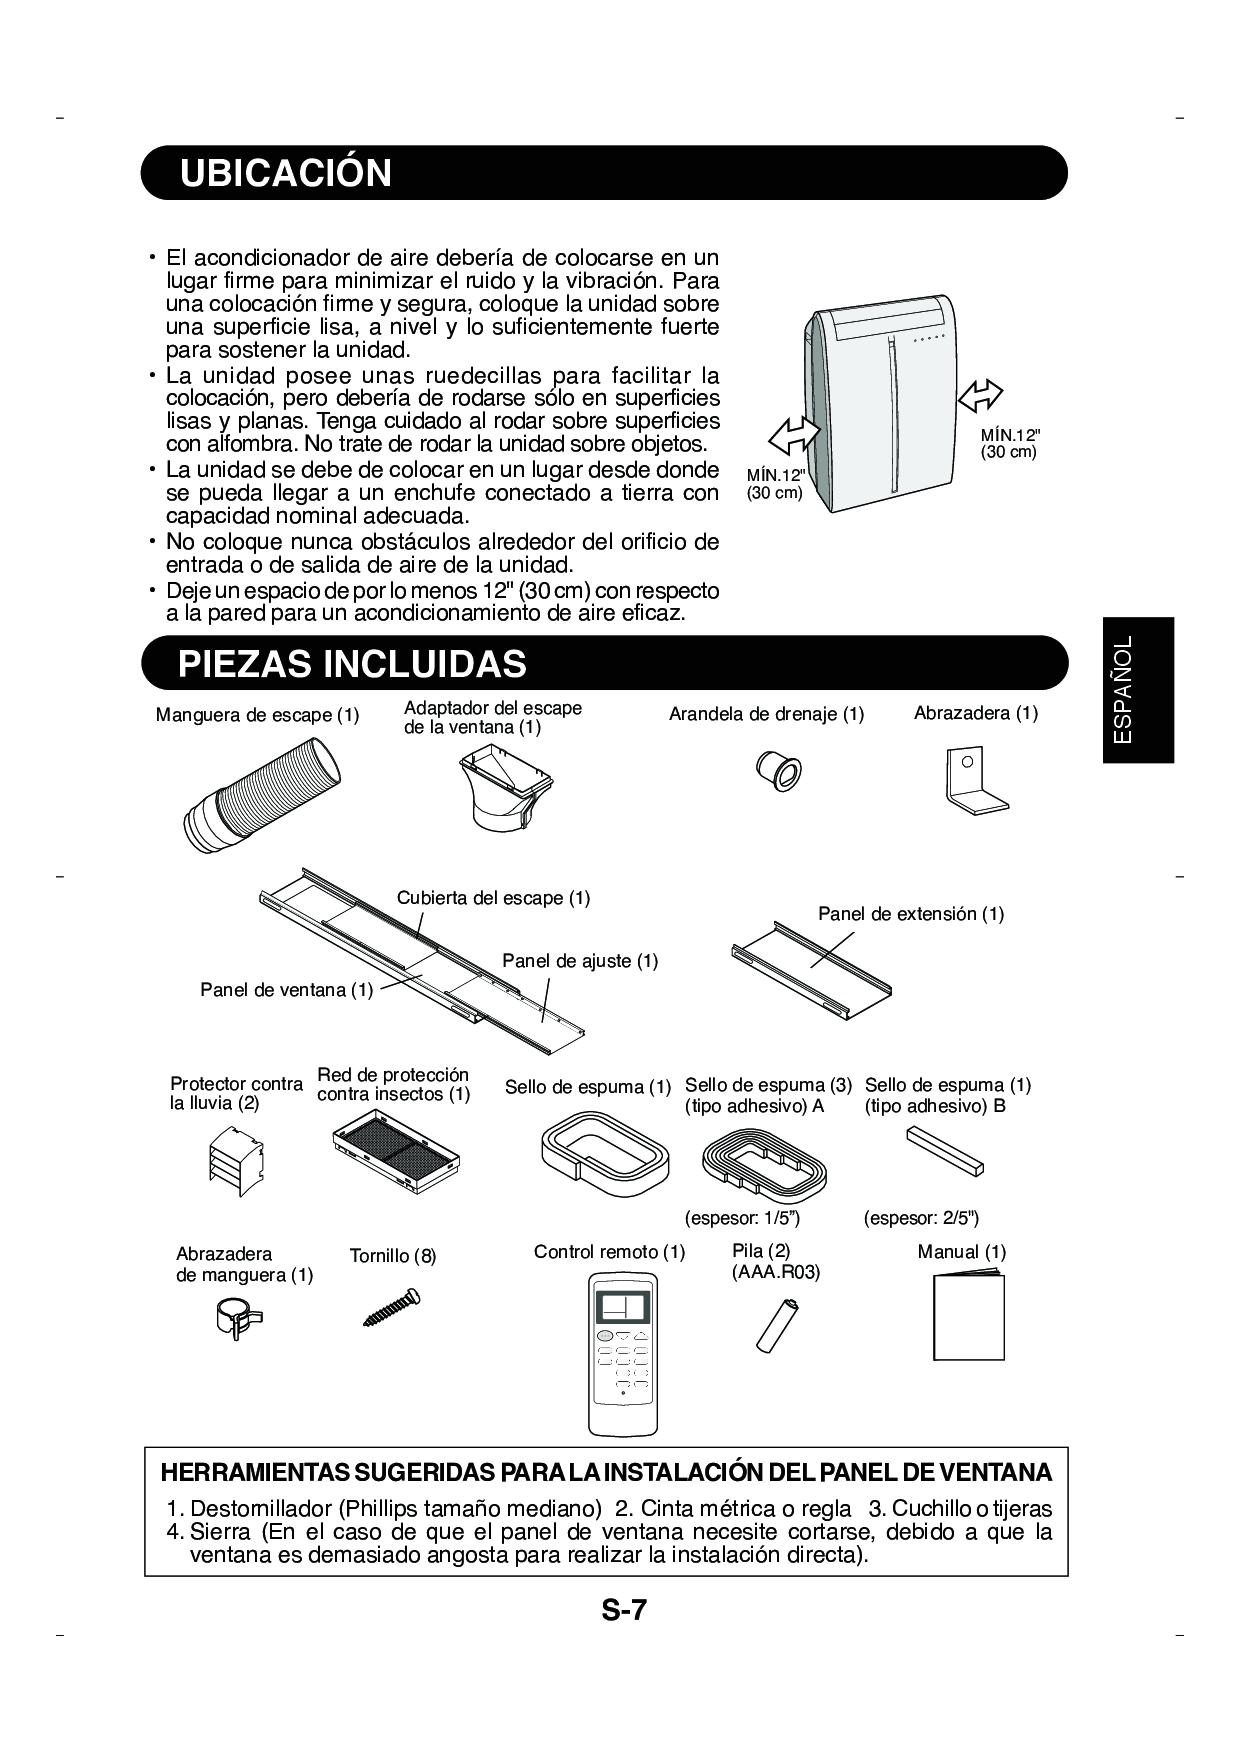 Sharp CV-P12LX, CV-P09LX, CV-P10MX, CV-P10LC User Manual